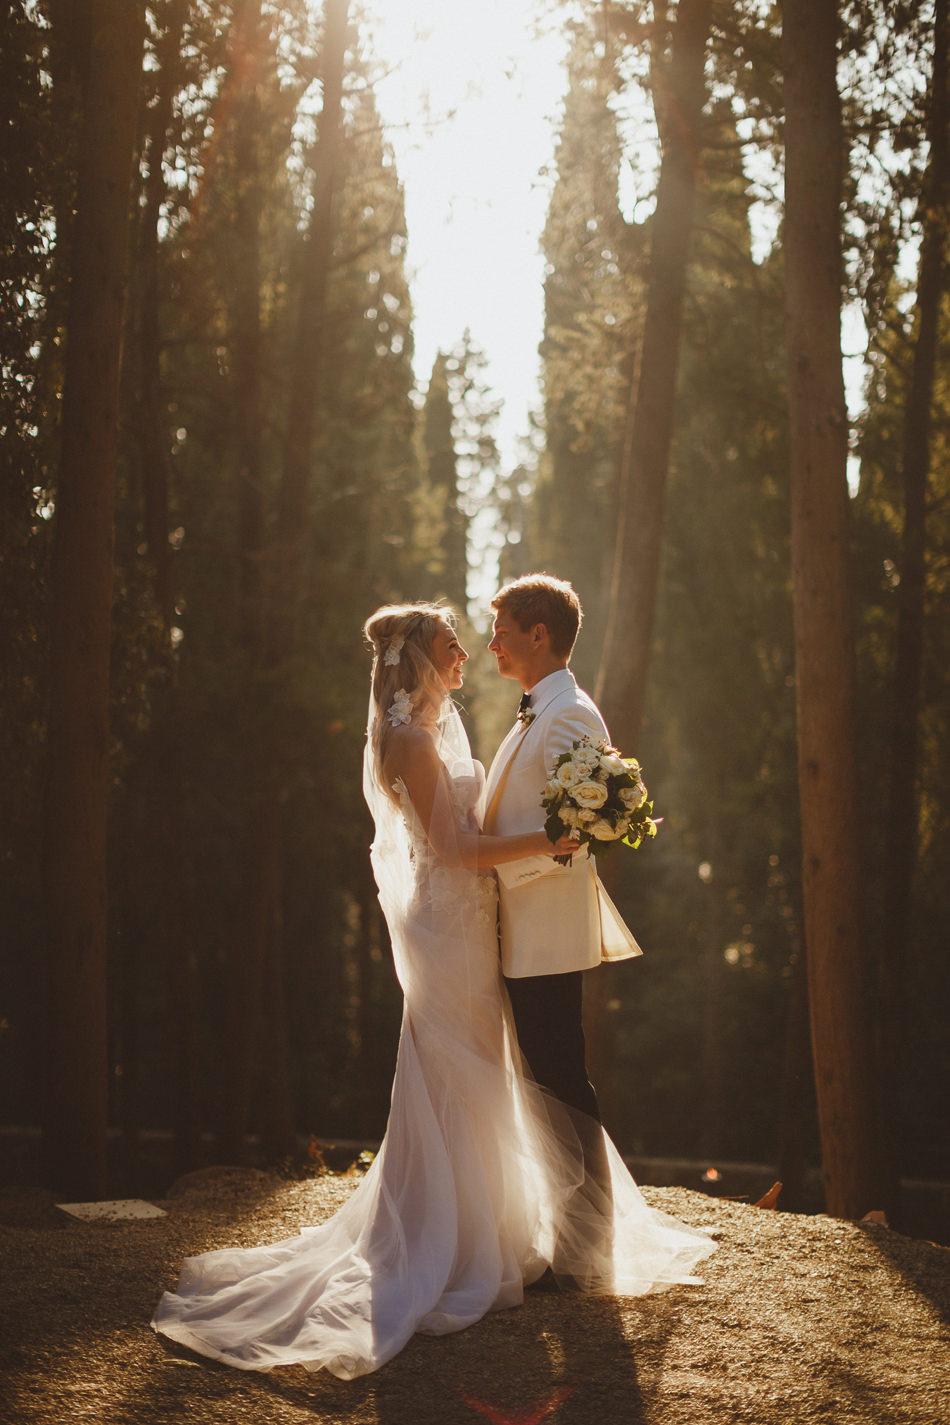 Uncategorized outdoor vintage glam wedding rustic wedding chic - Rustic Weddings